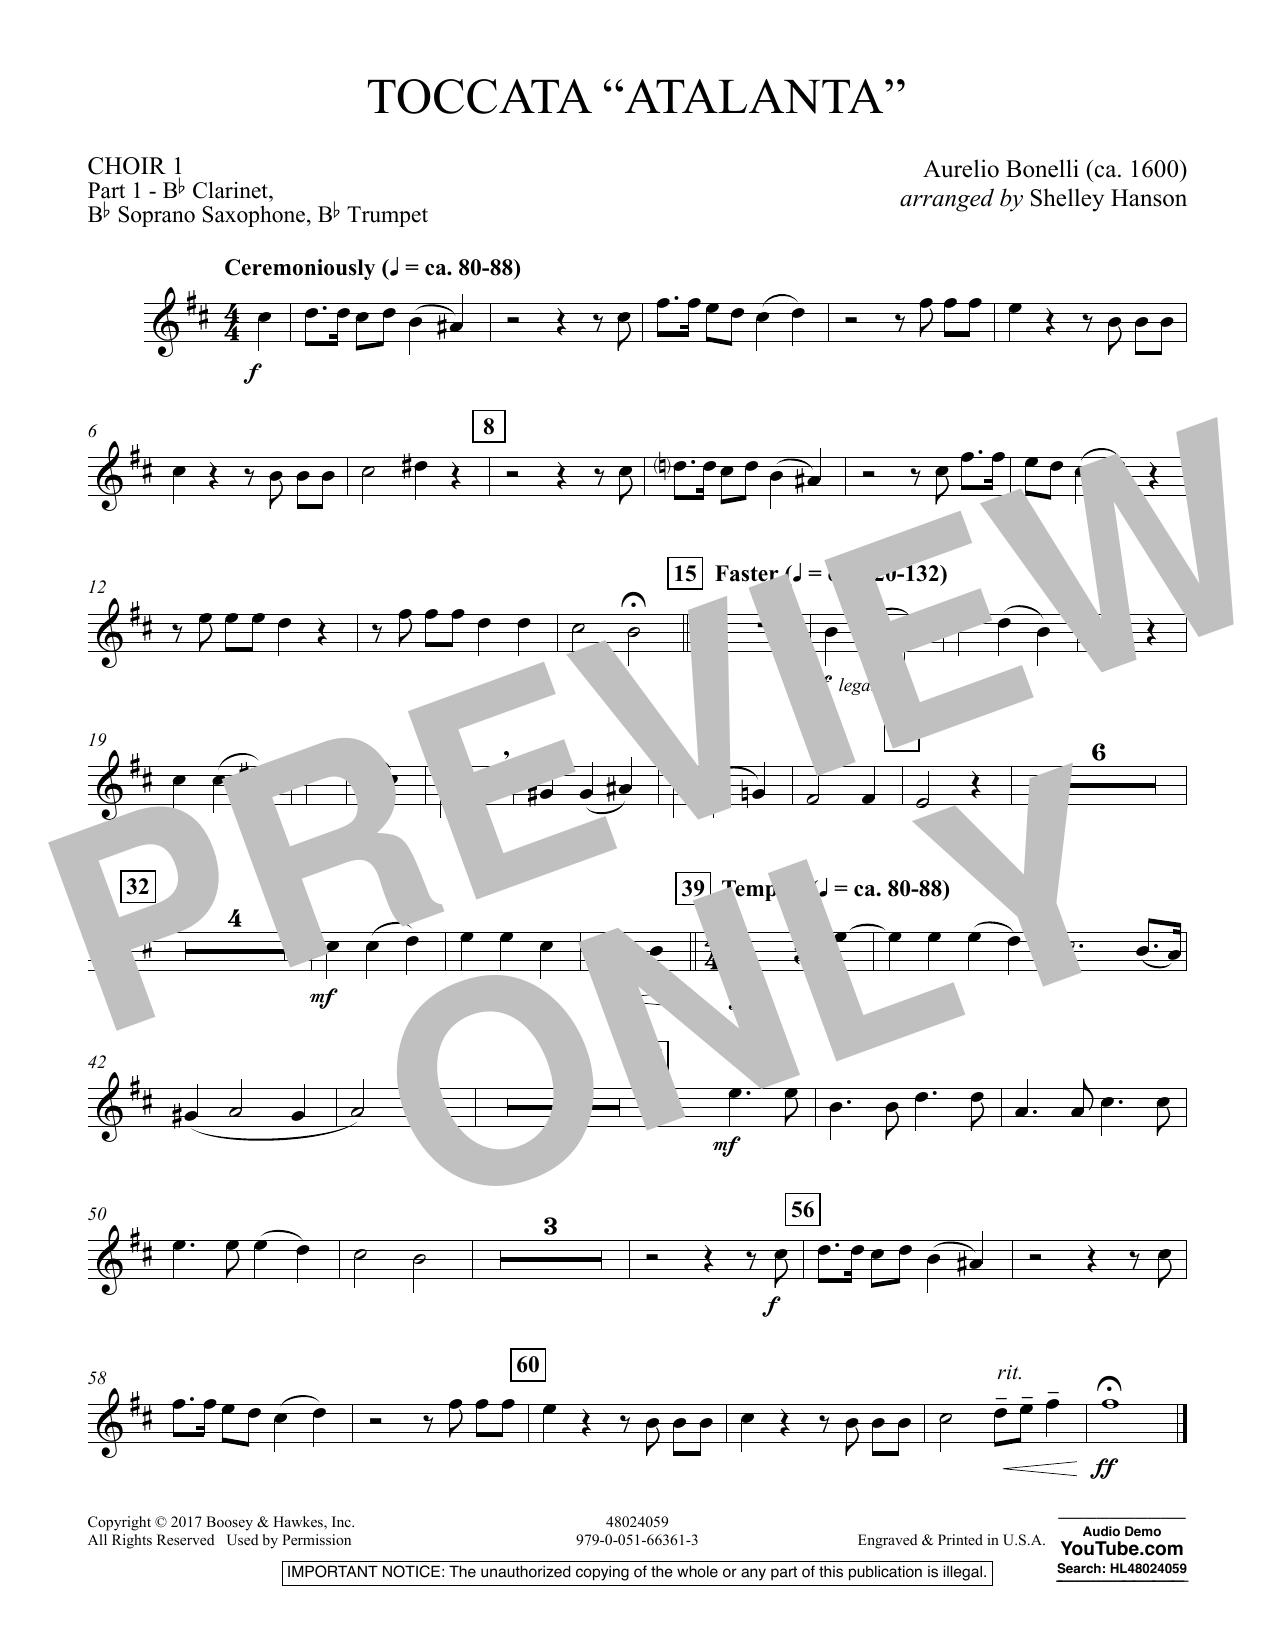 "Toccata (""Atalanta"") - Choir 1-Pt 1-Clar, Sop Sx, Tpt (Concert Band)"